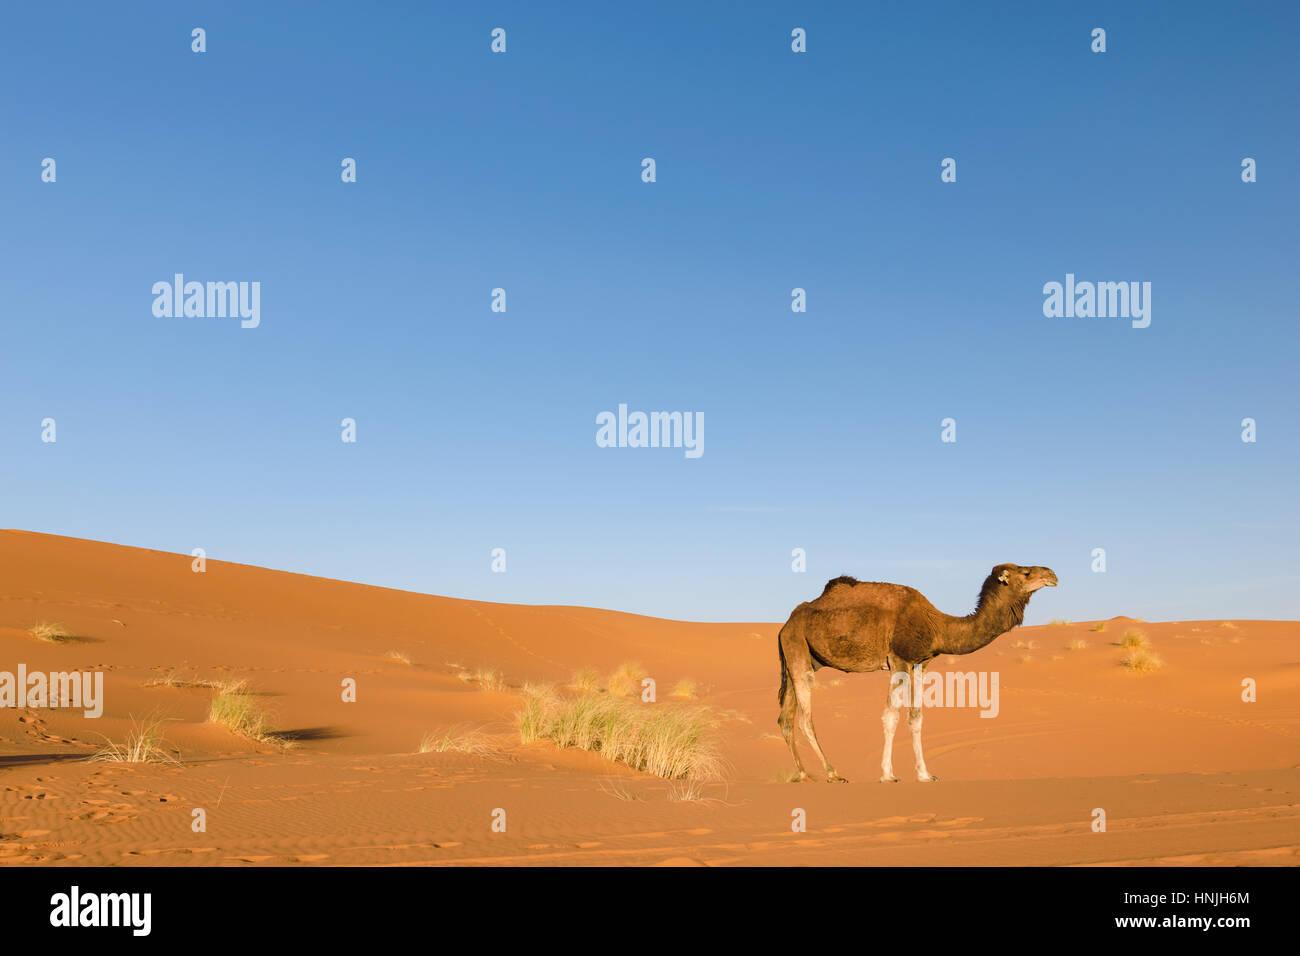 Dromedary in the desert Erg Chebbi, Morocco - Stock Image